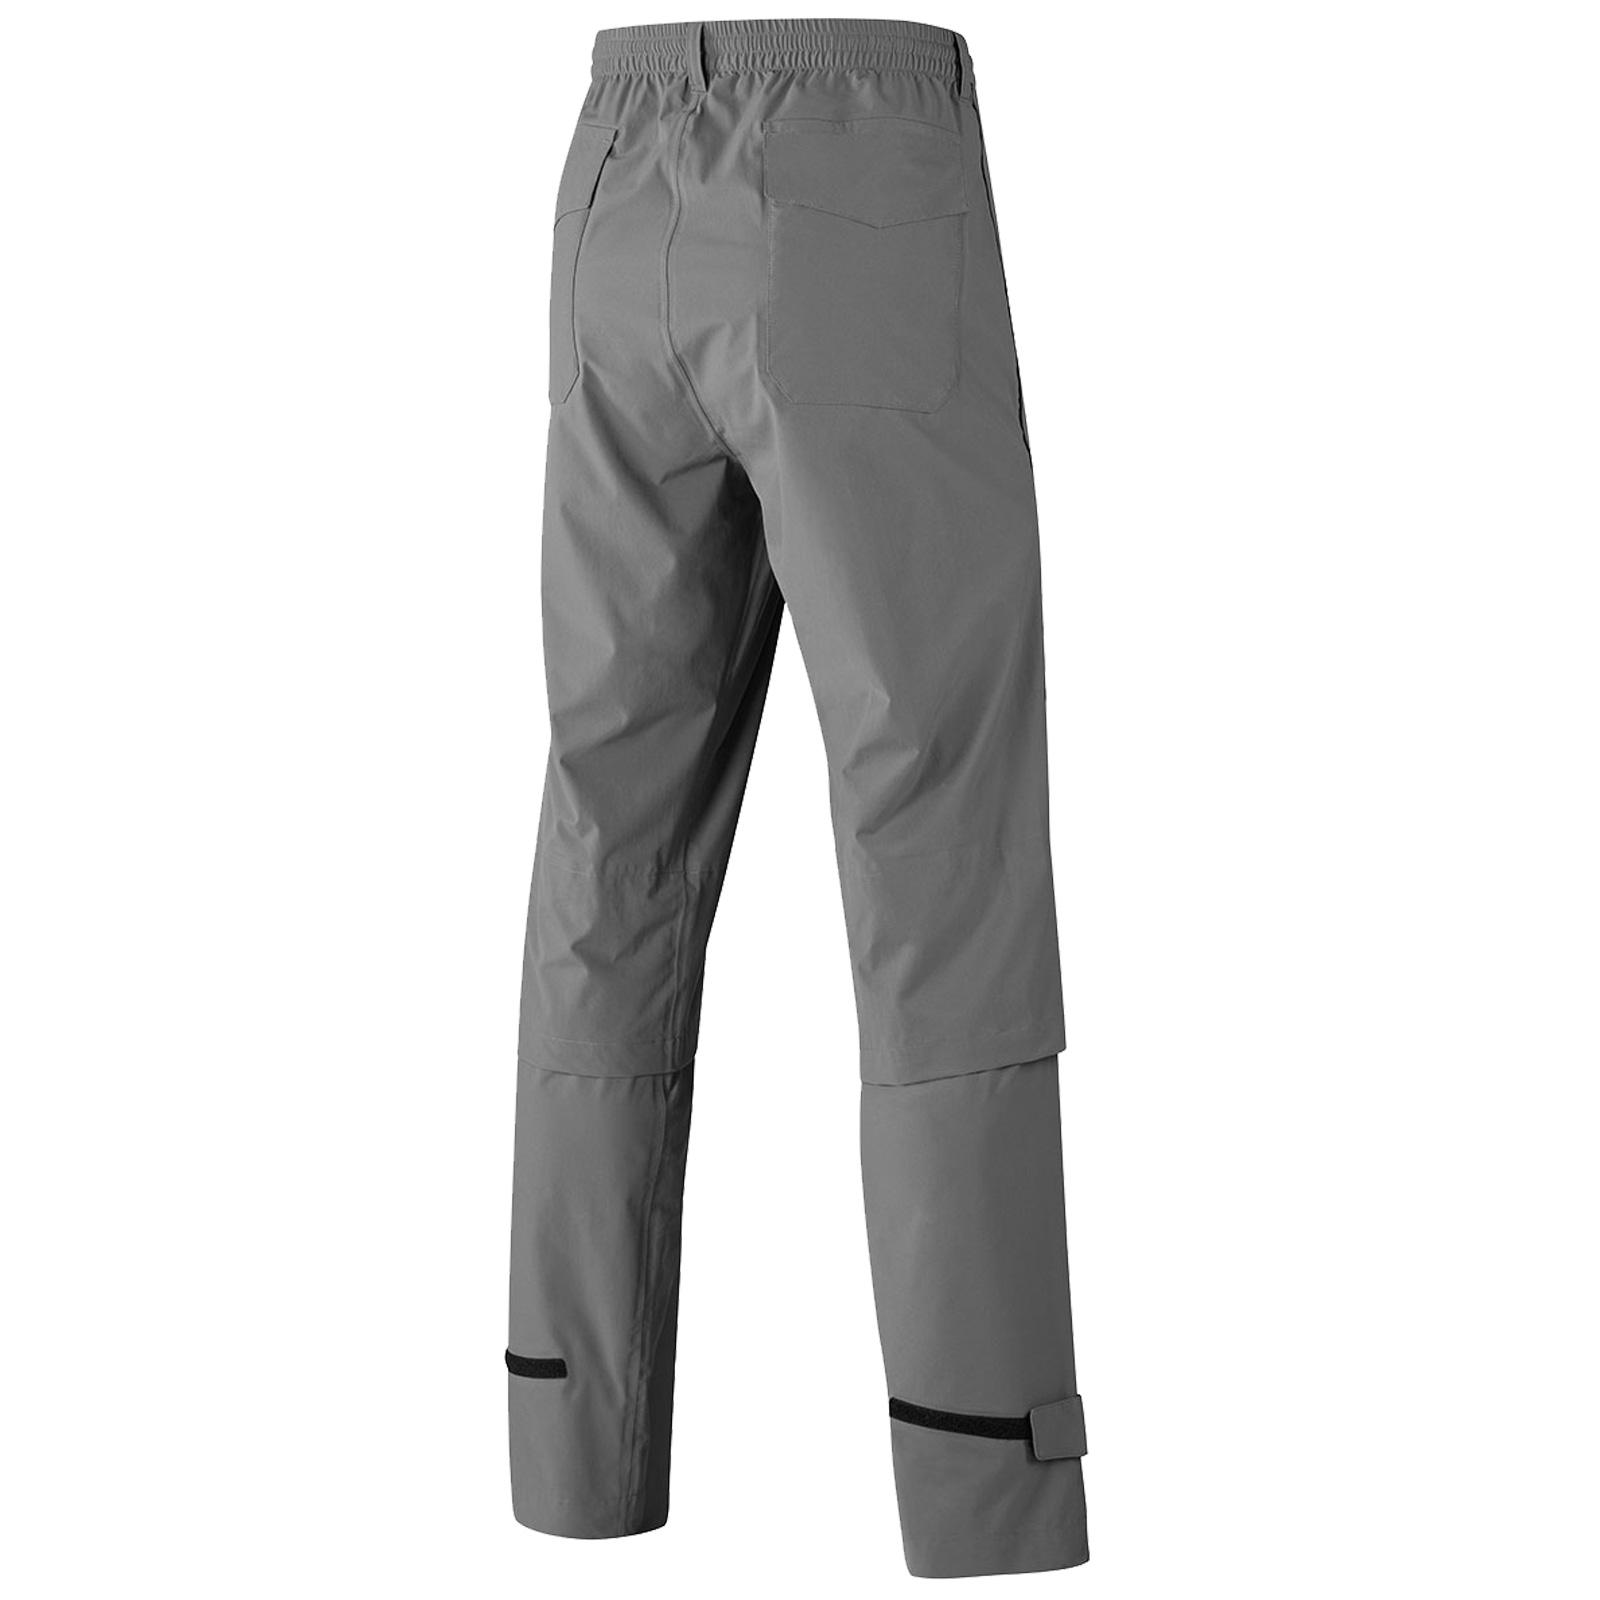 Mizuno-Mens-Impermalite-F20-Waterproof-Rain-Trousers-Lightweight-Golf-Pant thumbnail 7